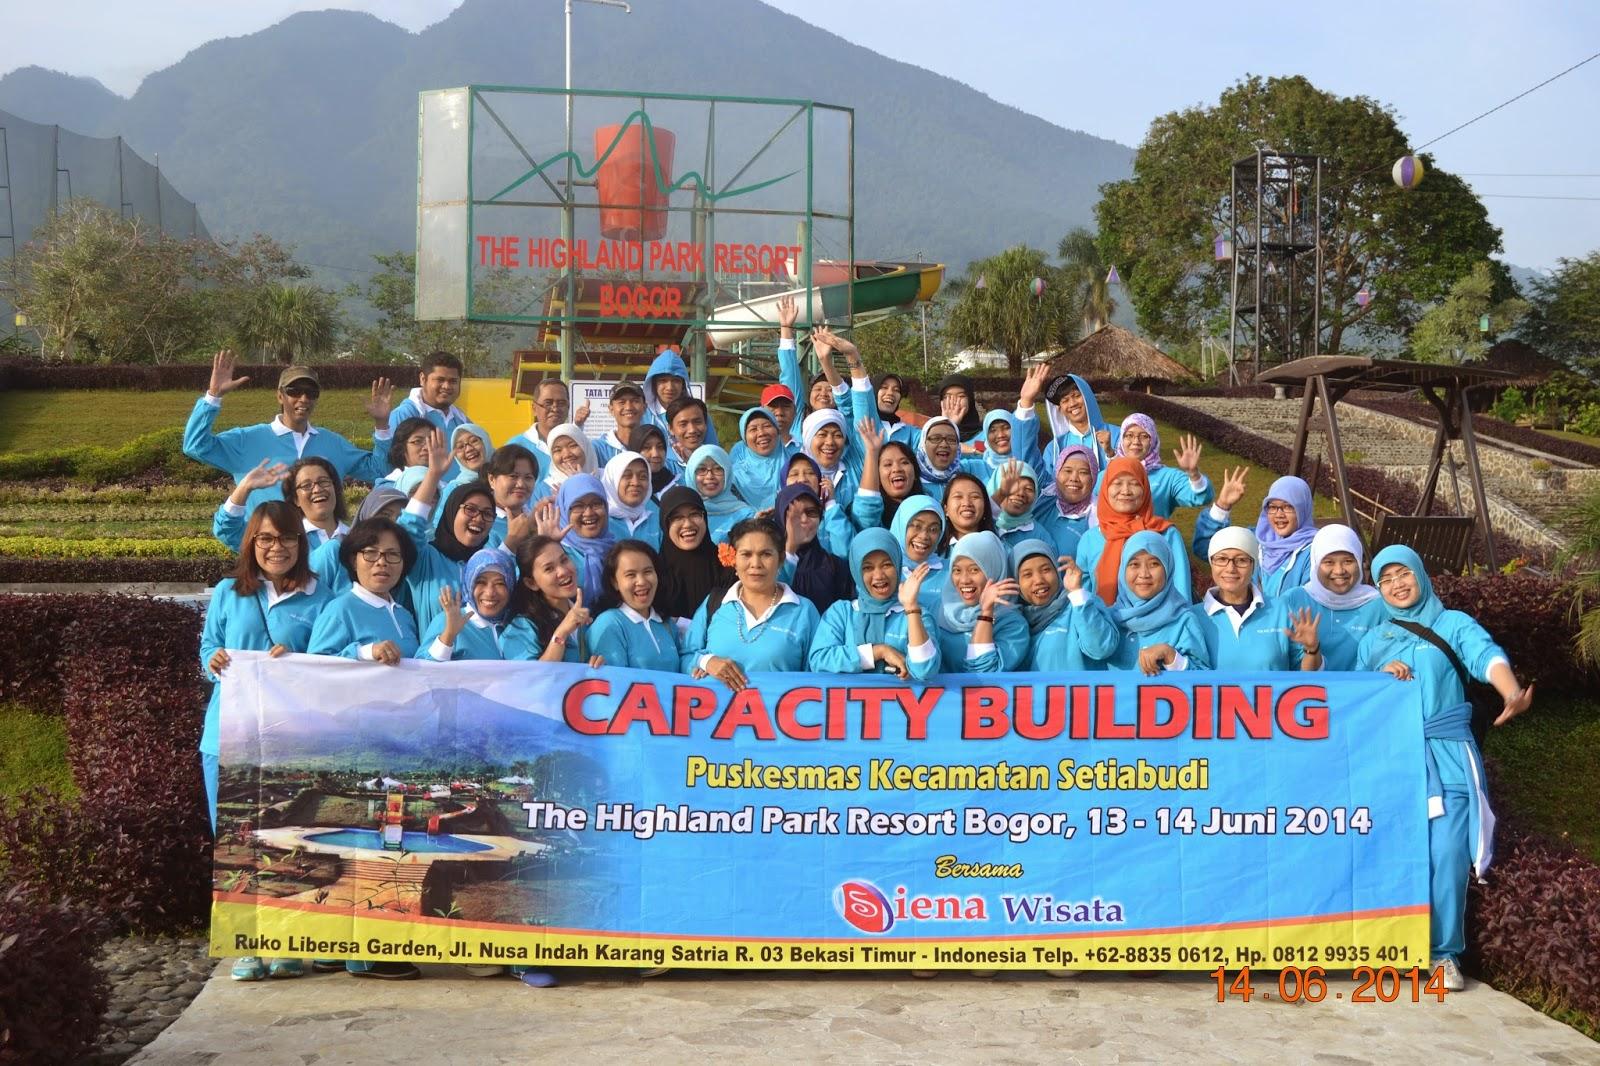 The Highland Park Resort Bogor With Siena Wisata Capacity